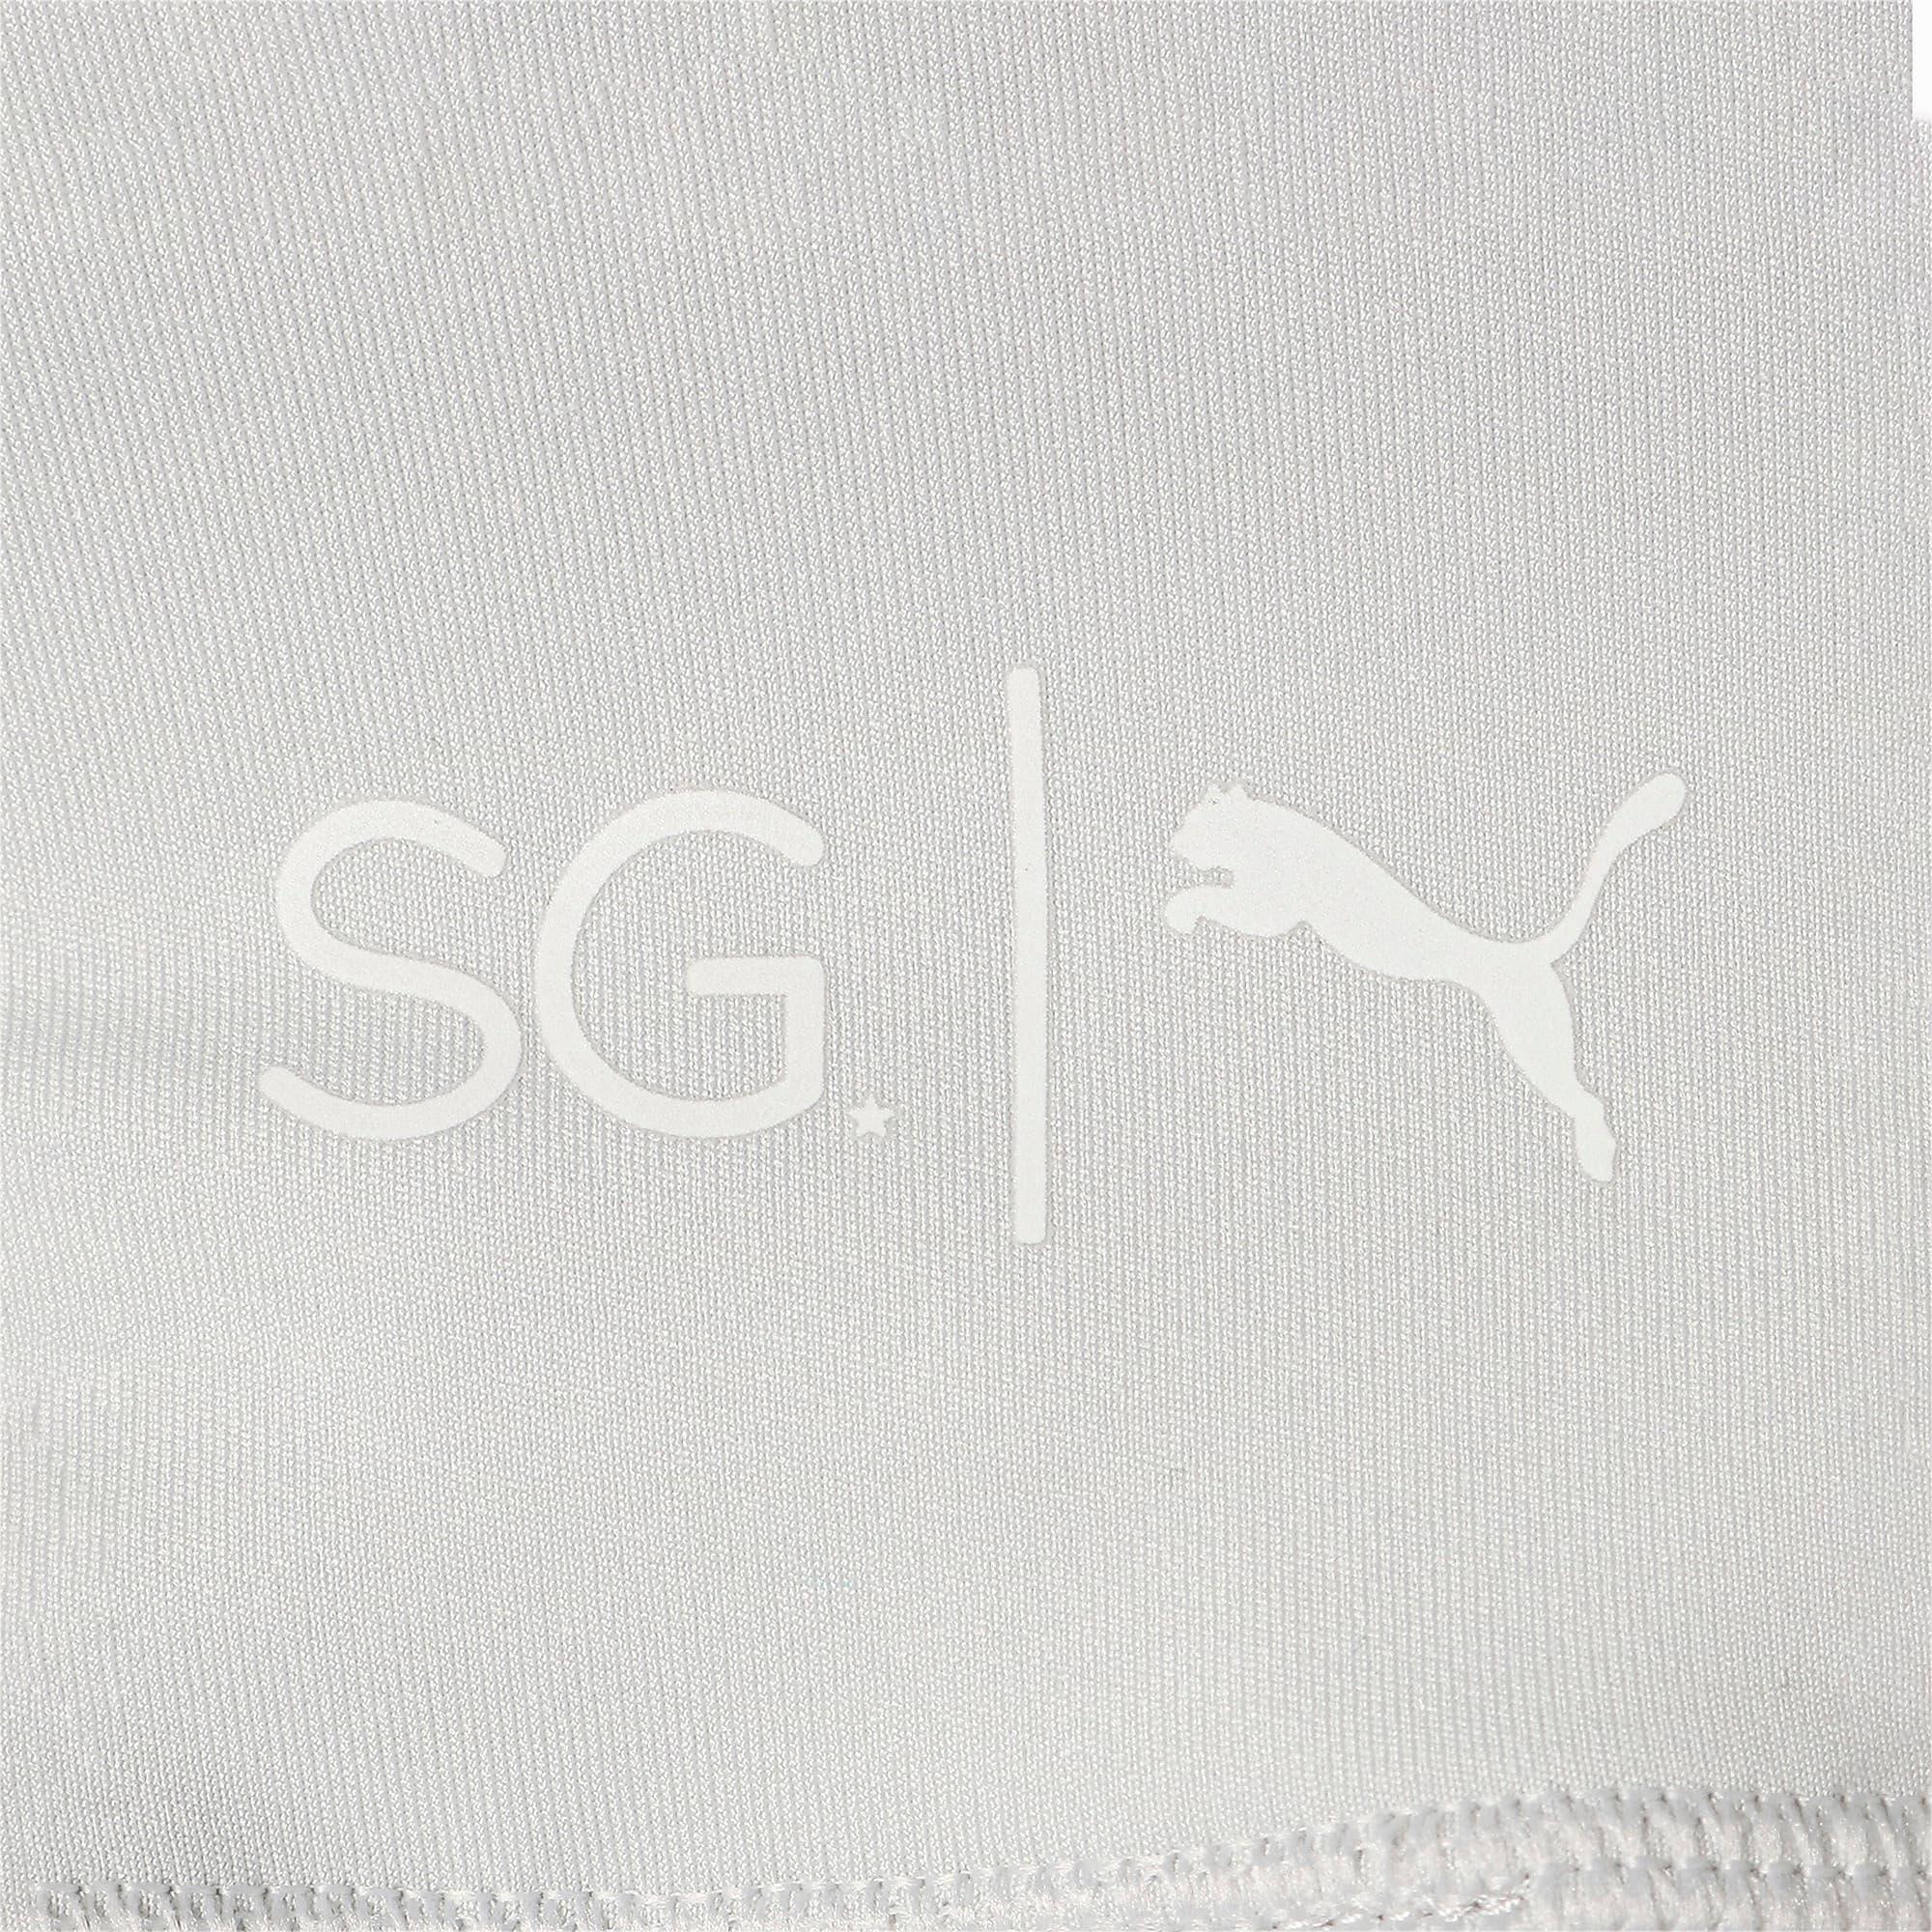 Thumbnail 12 of SG x PUMA ウィメンズ タイツ, Glacier Gray-Puma White, medium-JPN